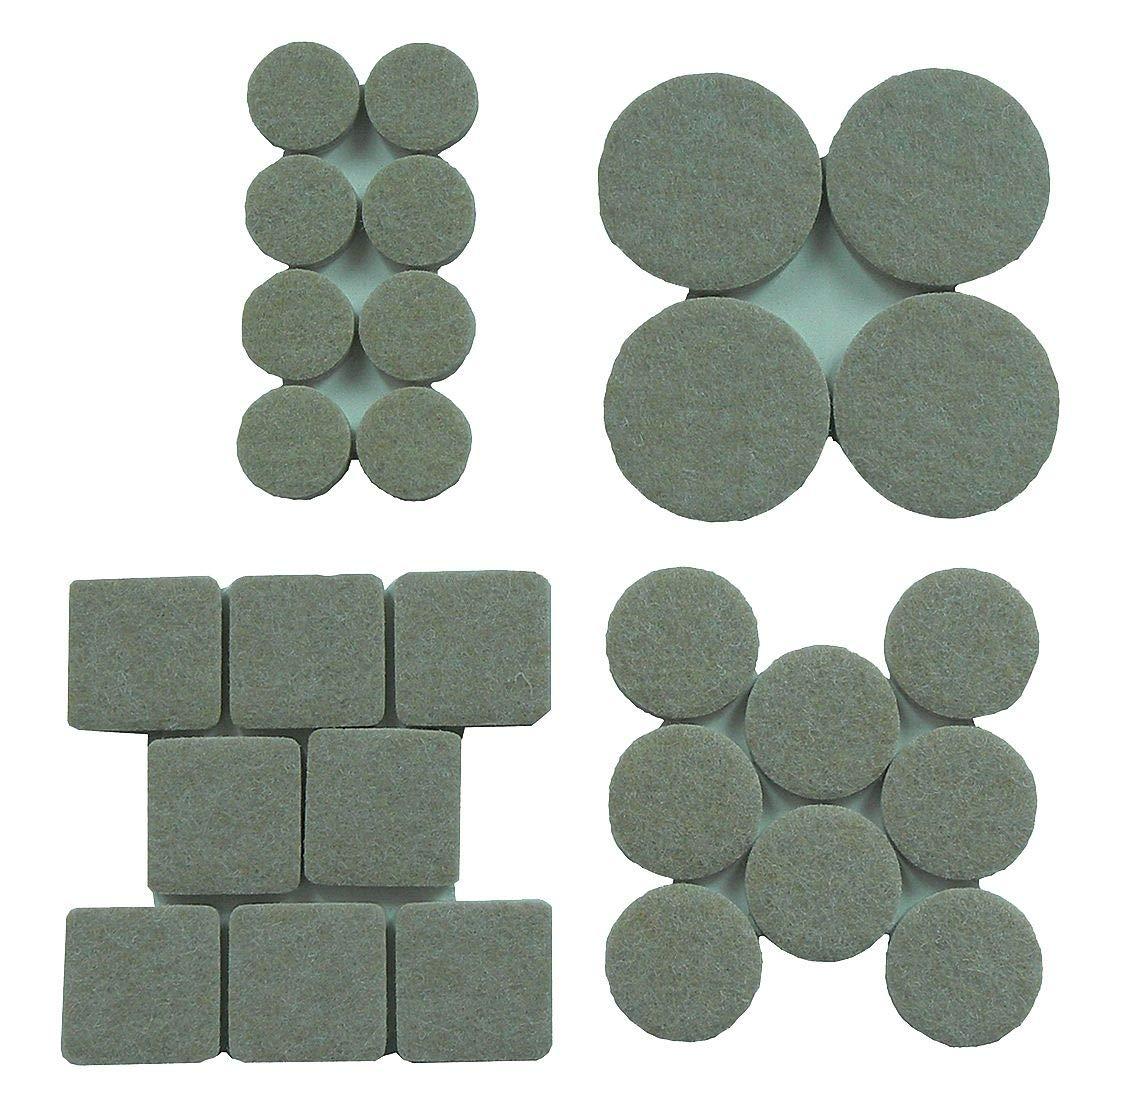 Round Self-Stick Adhesive Felt Pads, Tan, 2-1/2'' Dia., 4PK - 10J992 (Pack of 10)